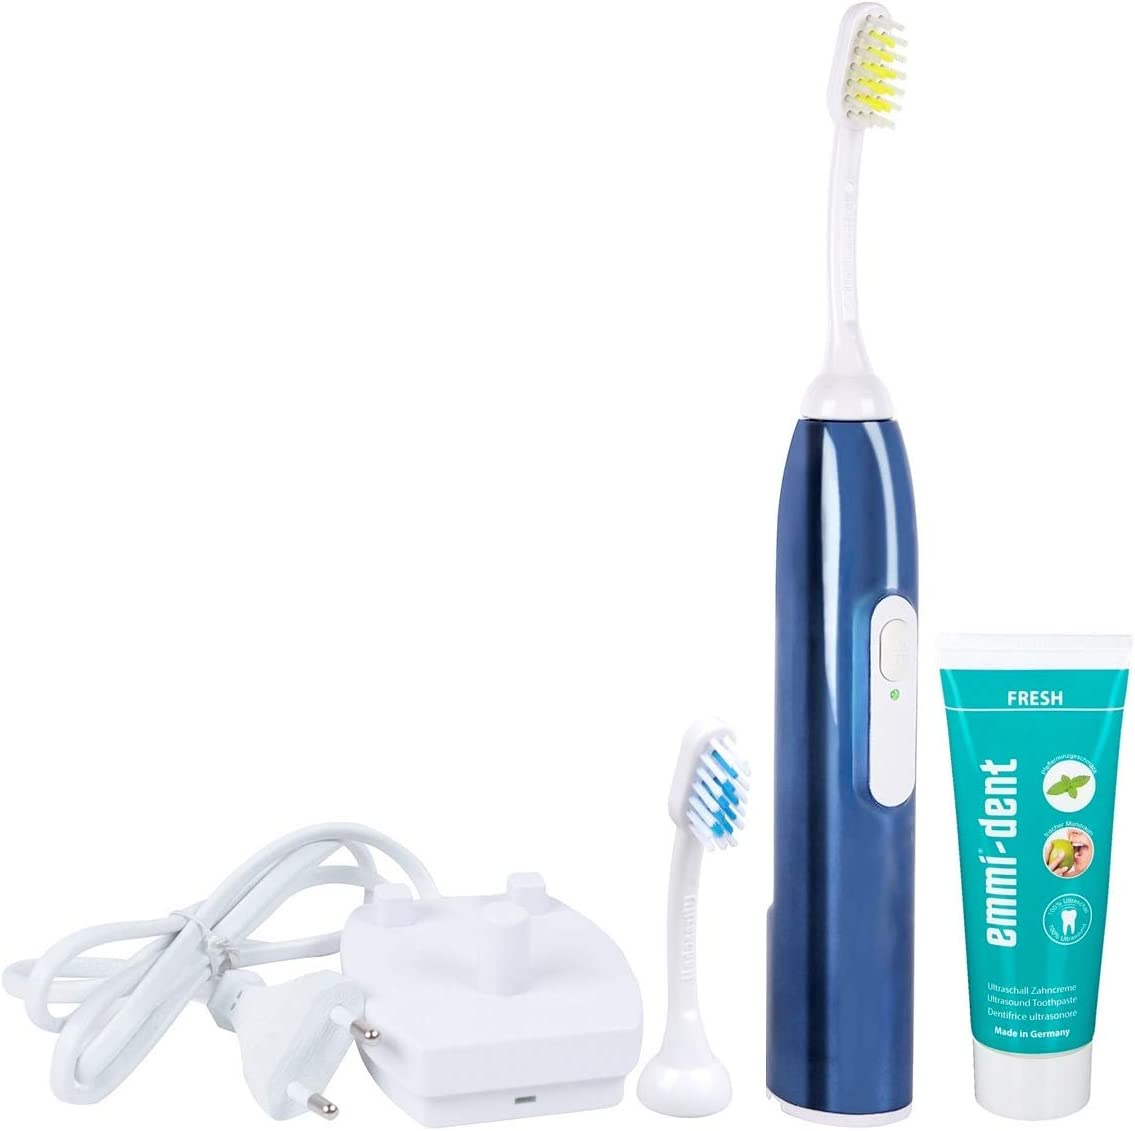 Emmi Dent Ultraschallzahnbürste blau